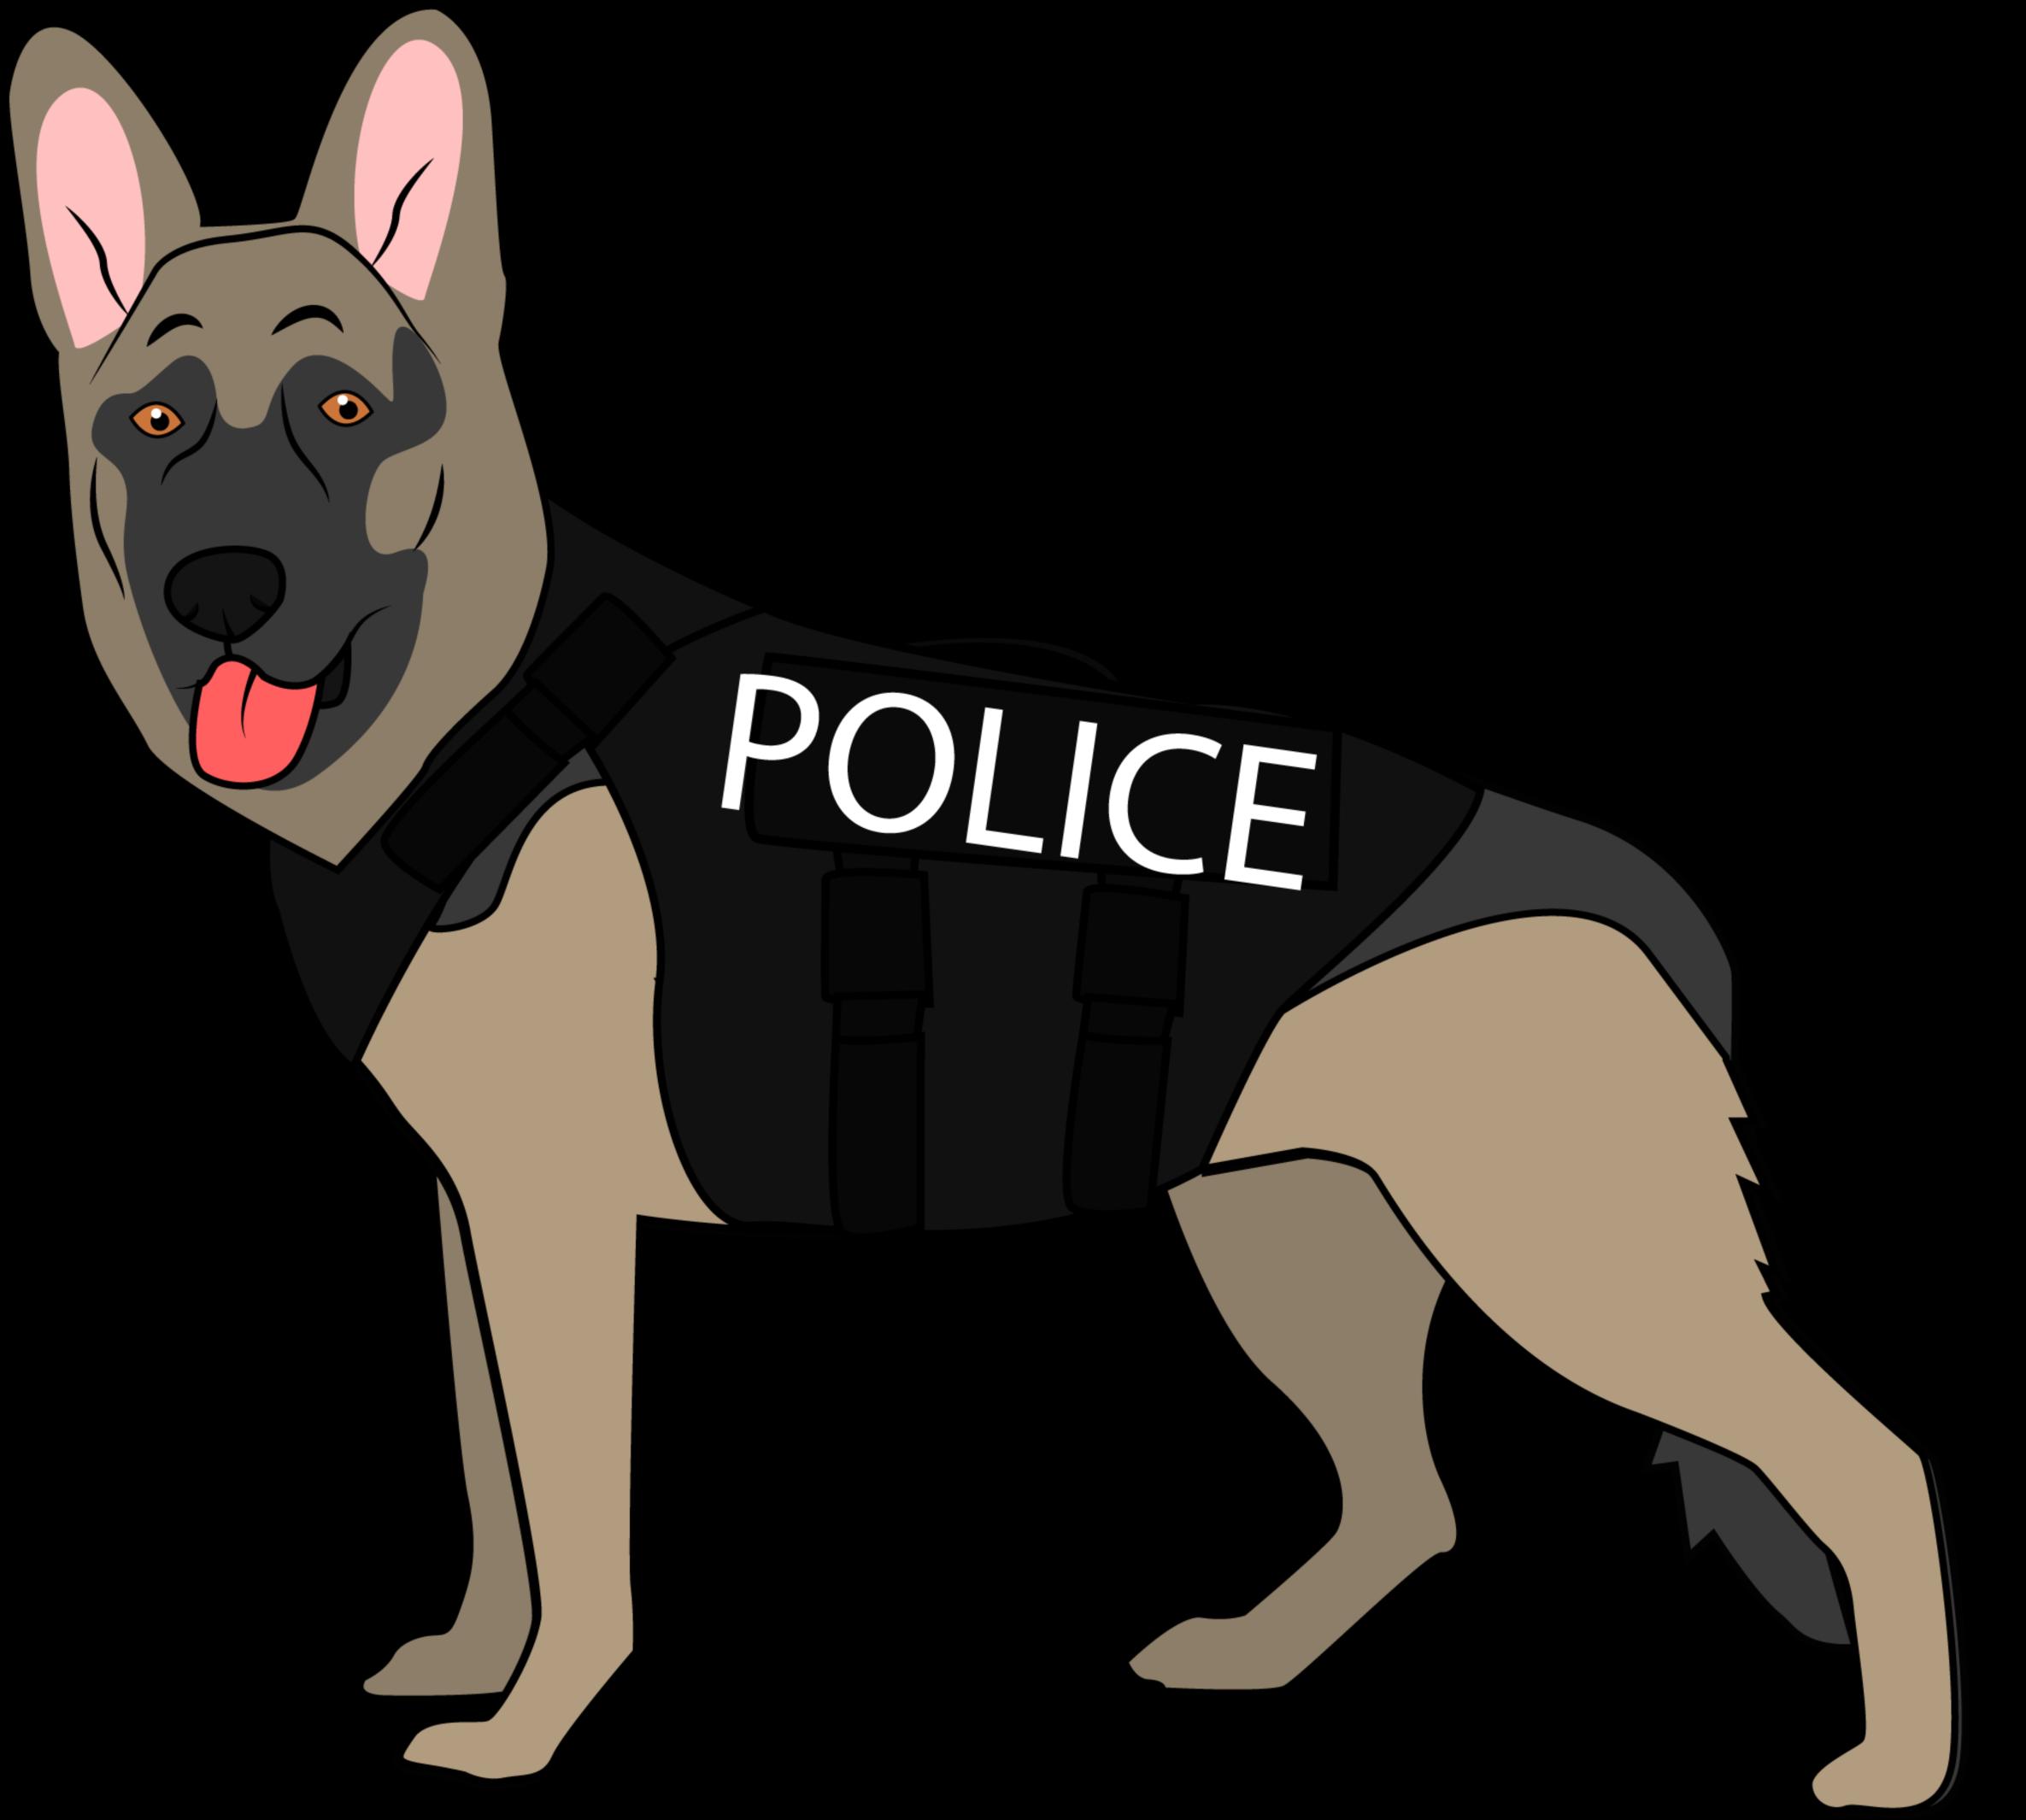 K police old german. Policeman clipart k9 dog